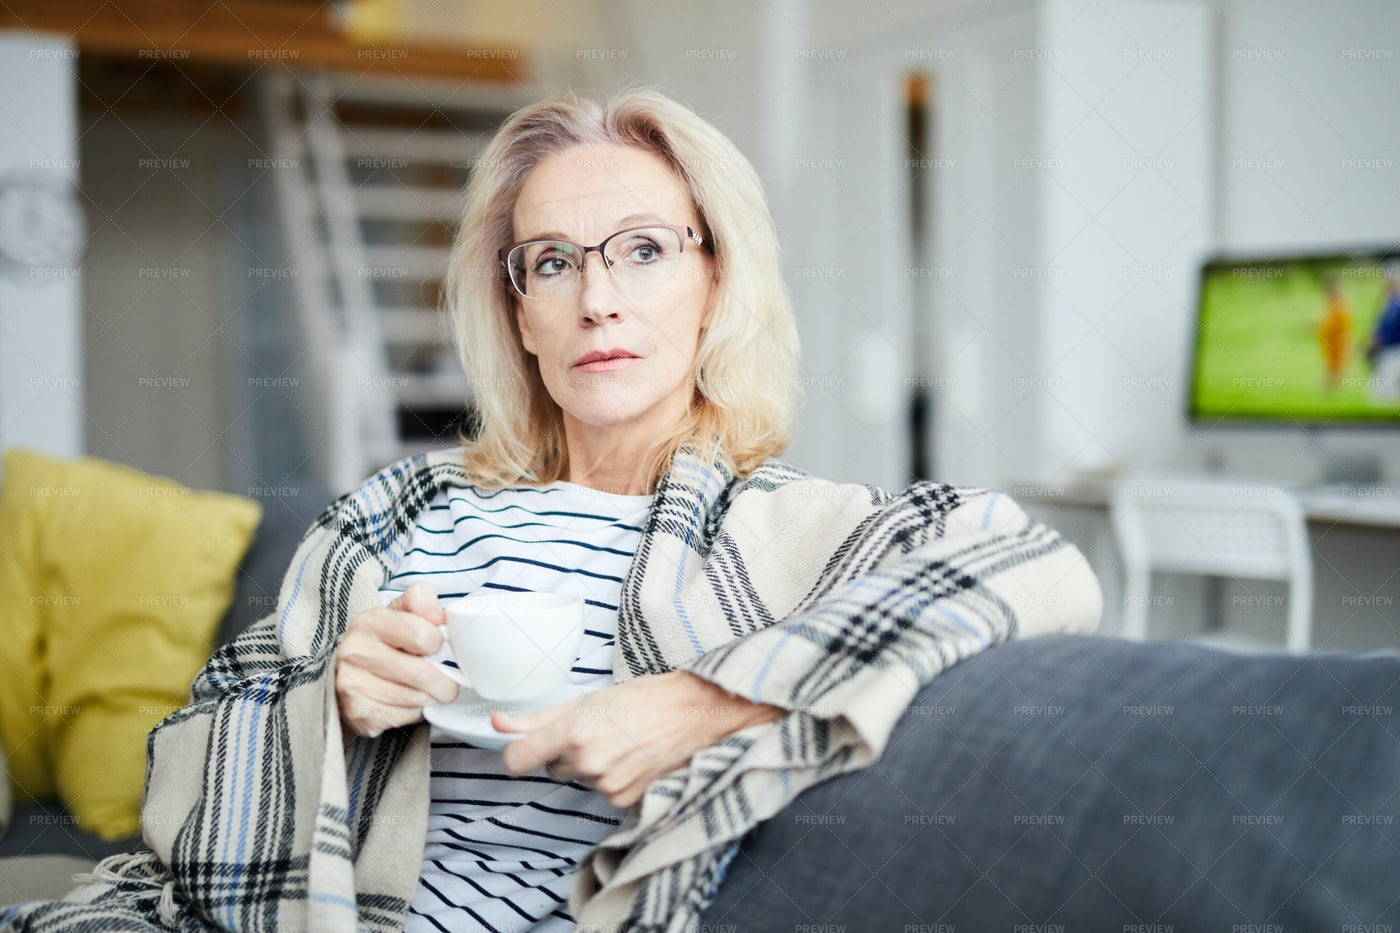 Pensive Adult Woman At Home: Stock Photos